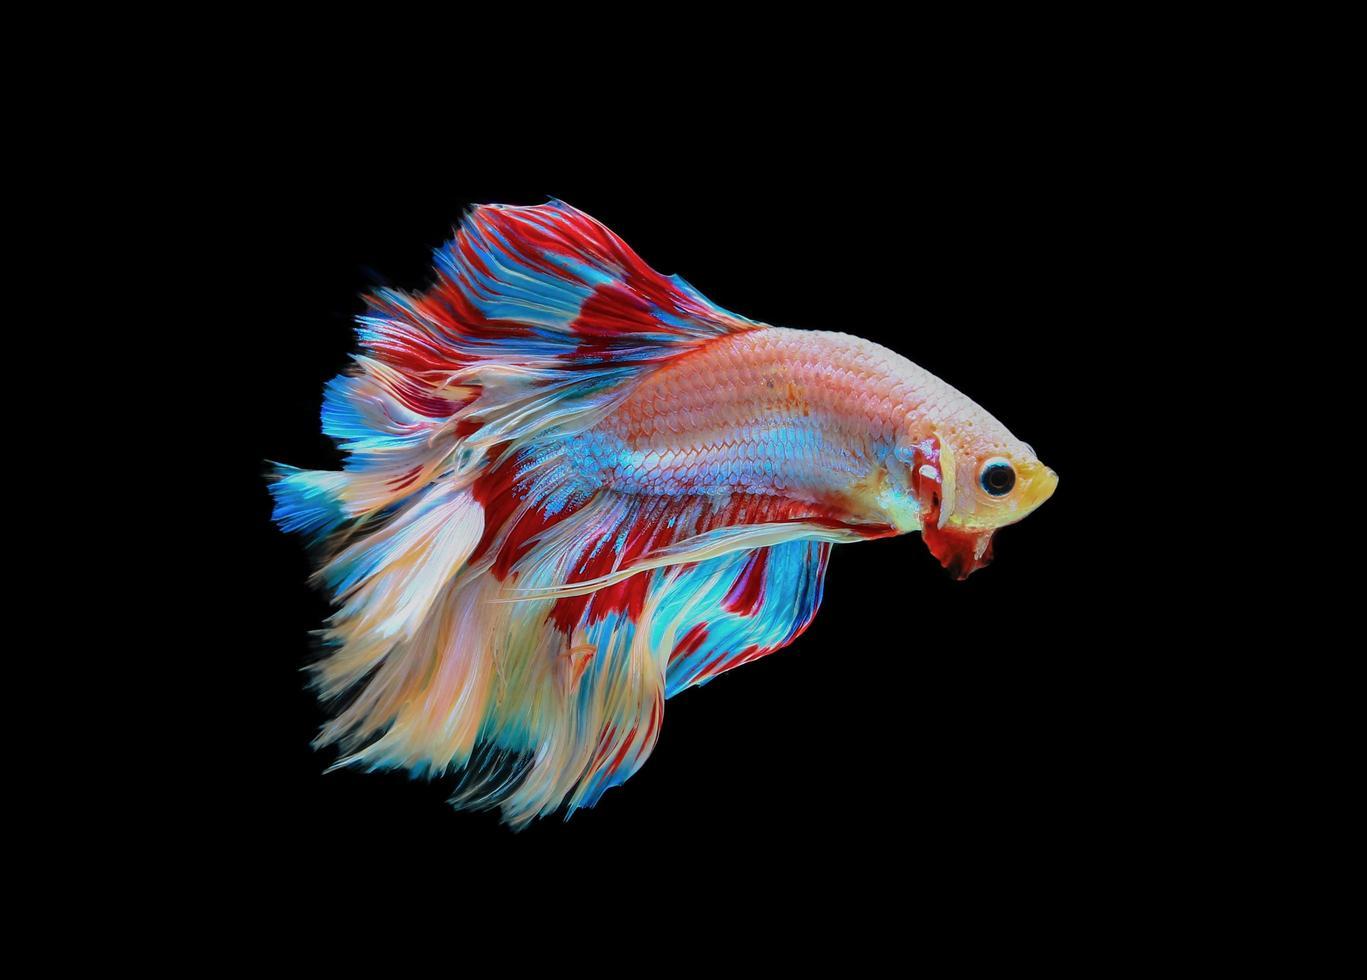 gros plan, de, a, coloré, poisson betta photo